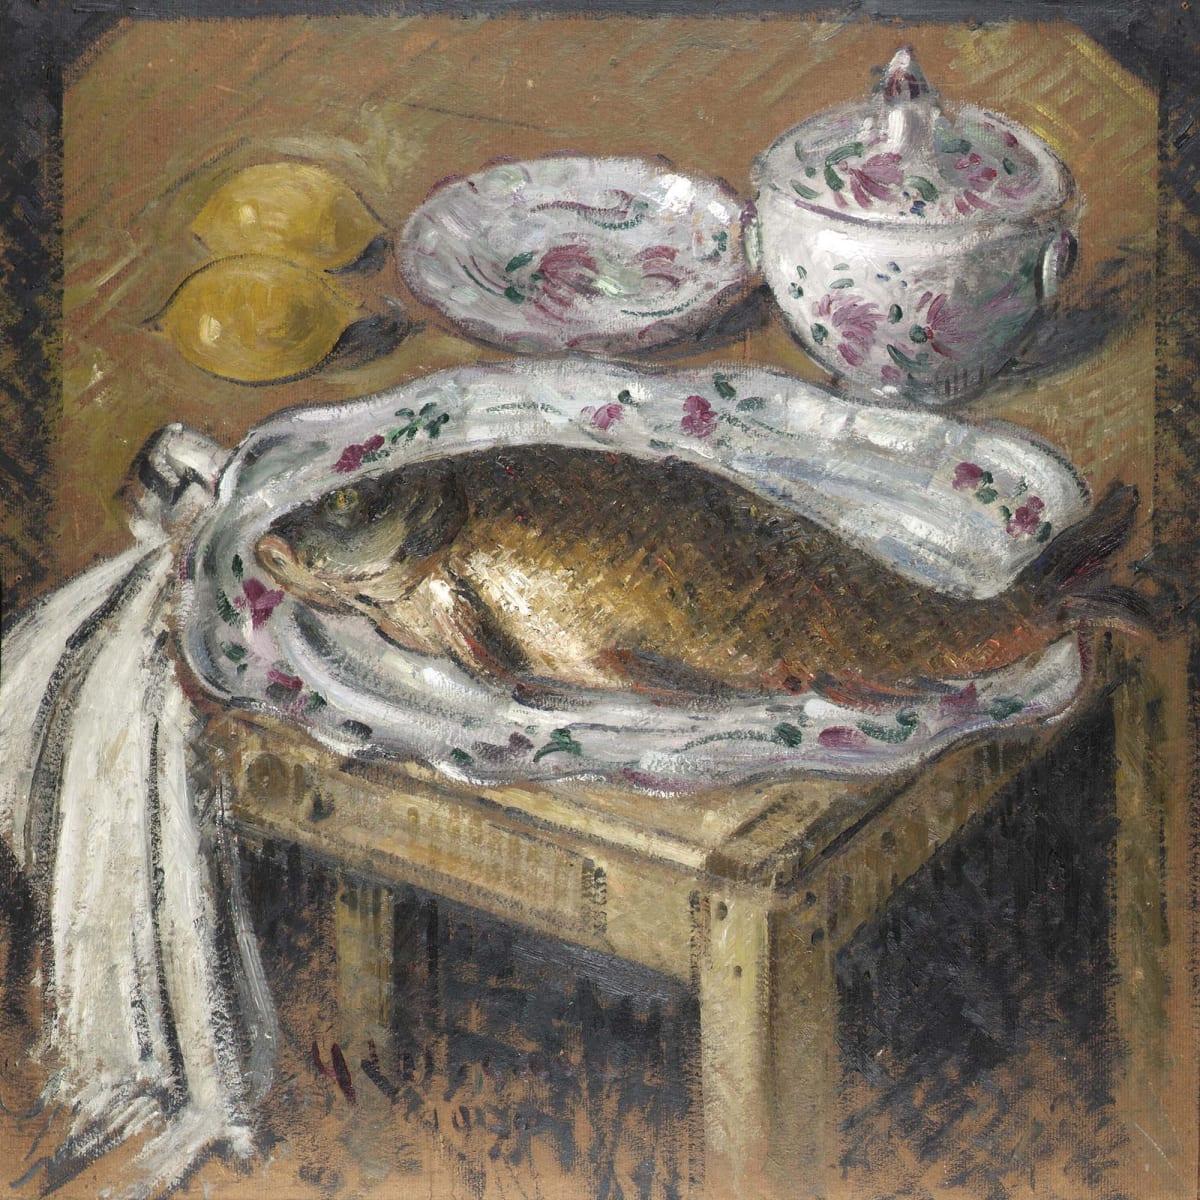 Gustave Loiseau, La carpe, 1930